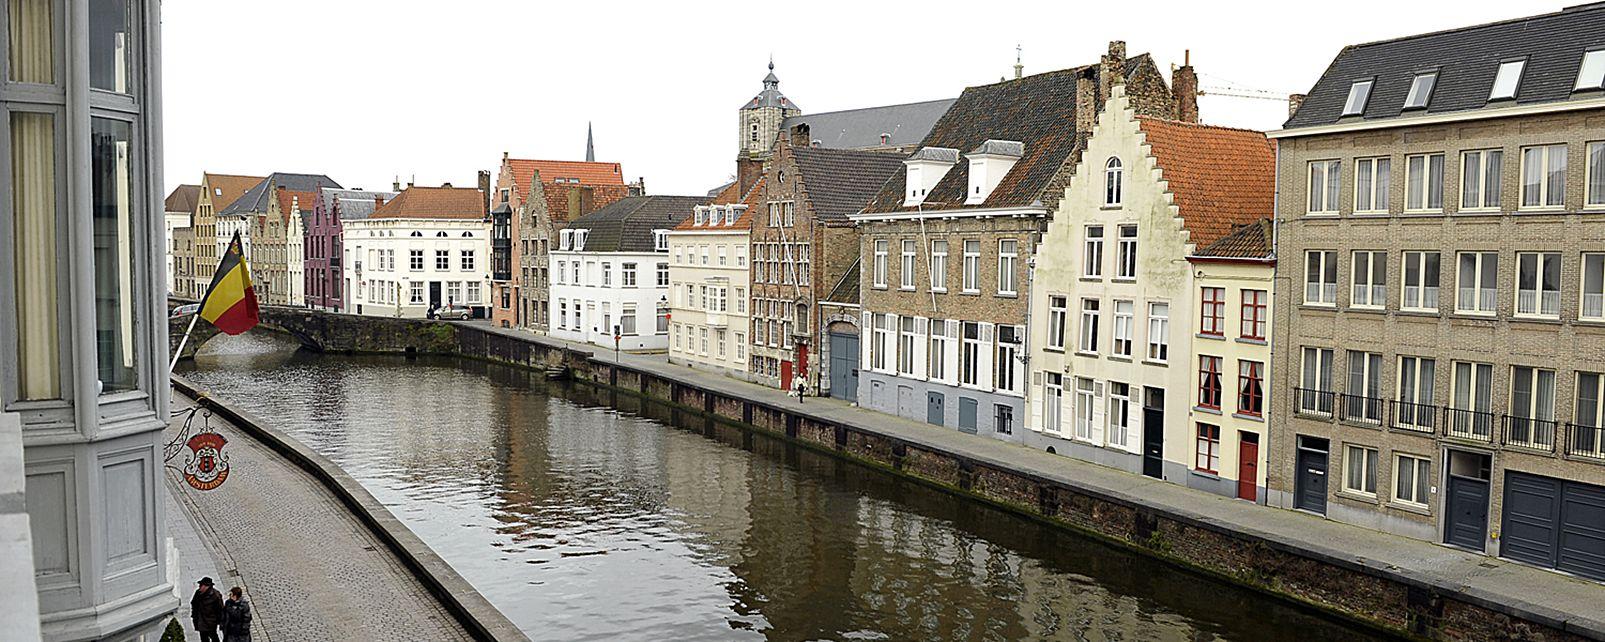 Hôtel Martin's Relais Oud Huis Amsterdam